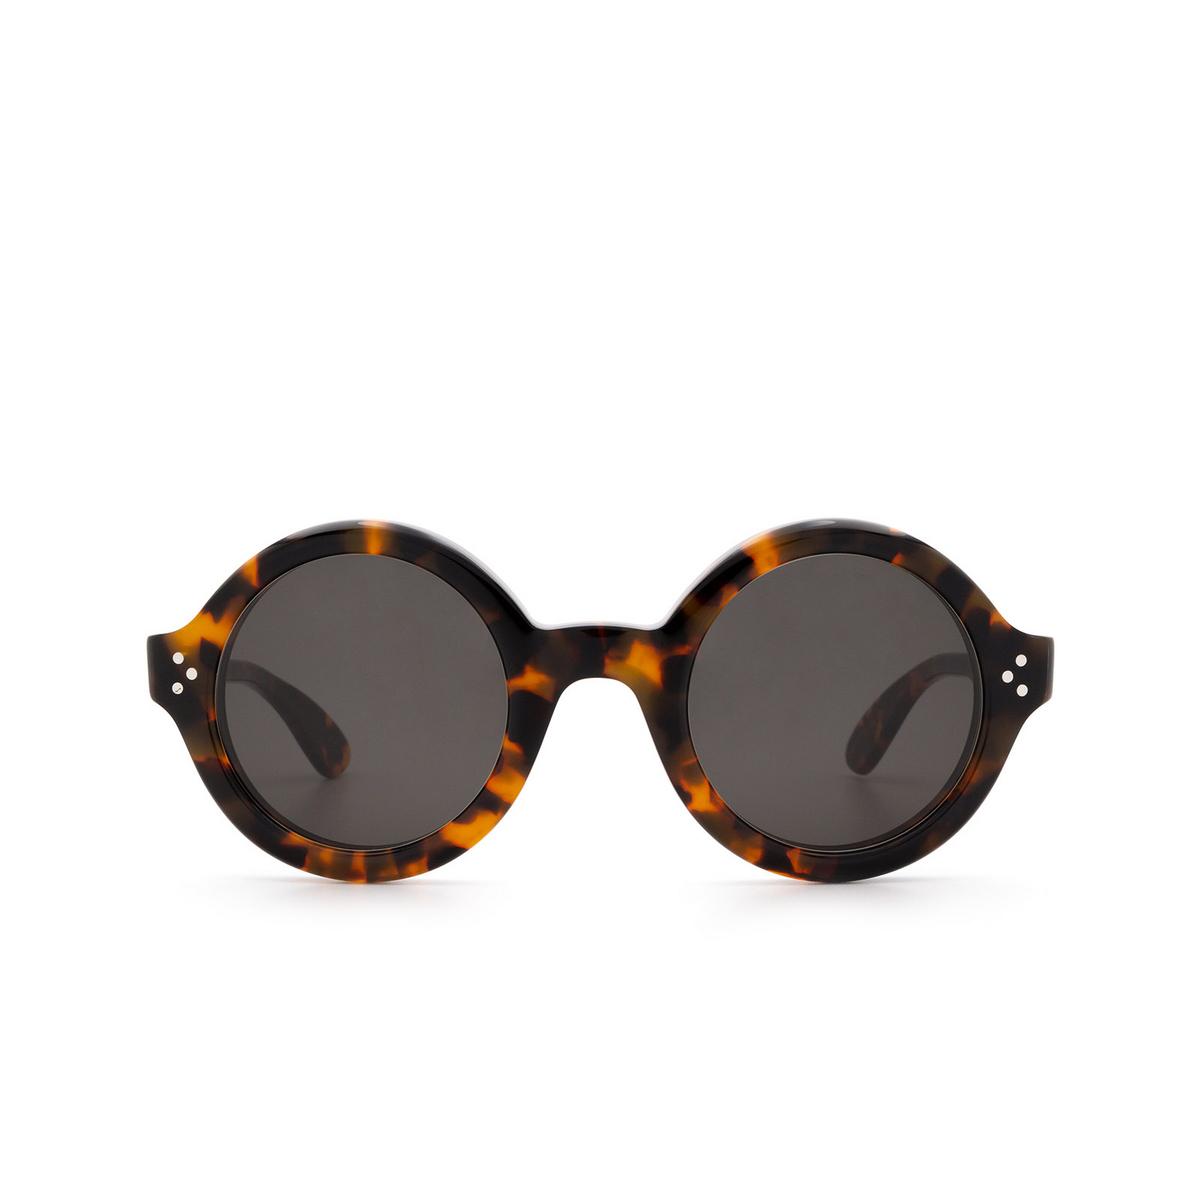 Lesca® Round Sunglasses: Phil Sun color Marble Tortoise H827 - front view.